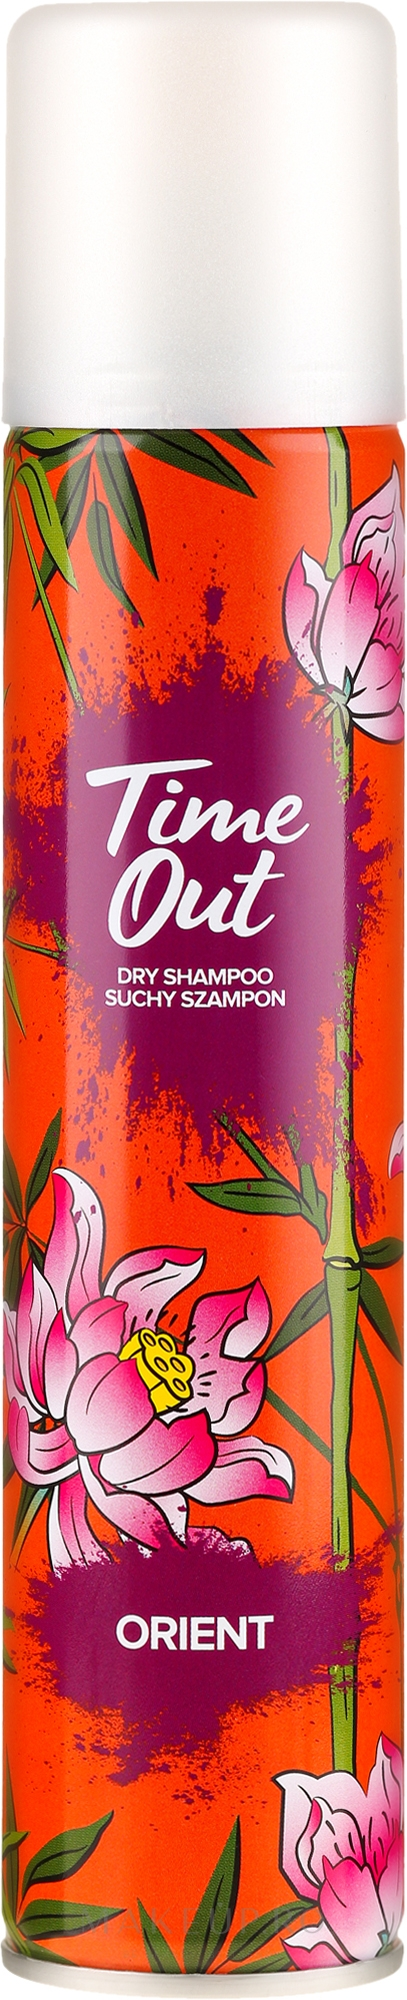 Șampon uscat pentru păr - Time Out Dry Shampoo Orient — Imagine 200 ml